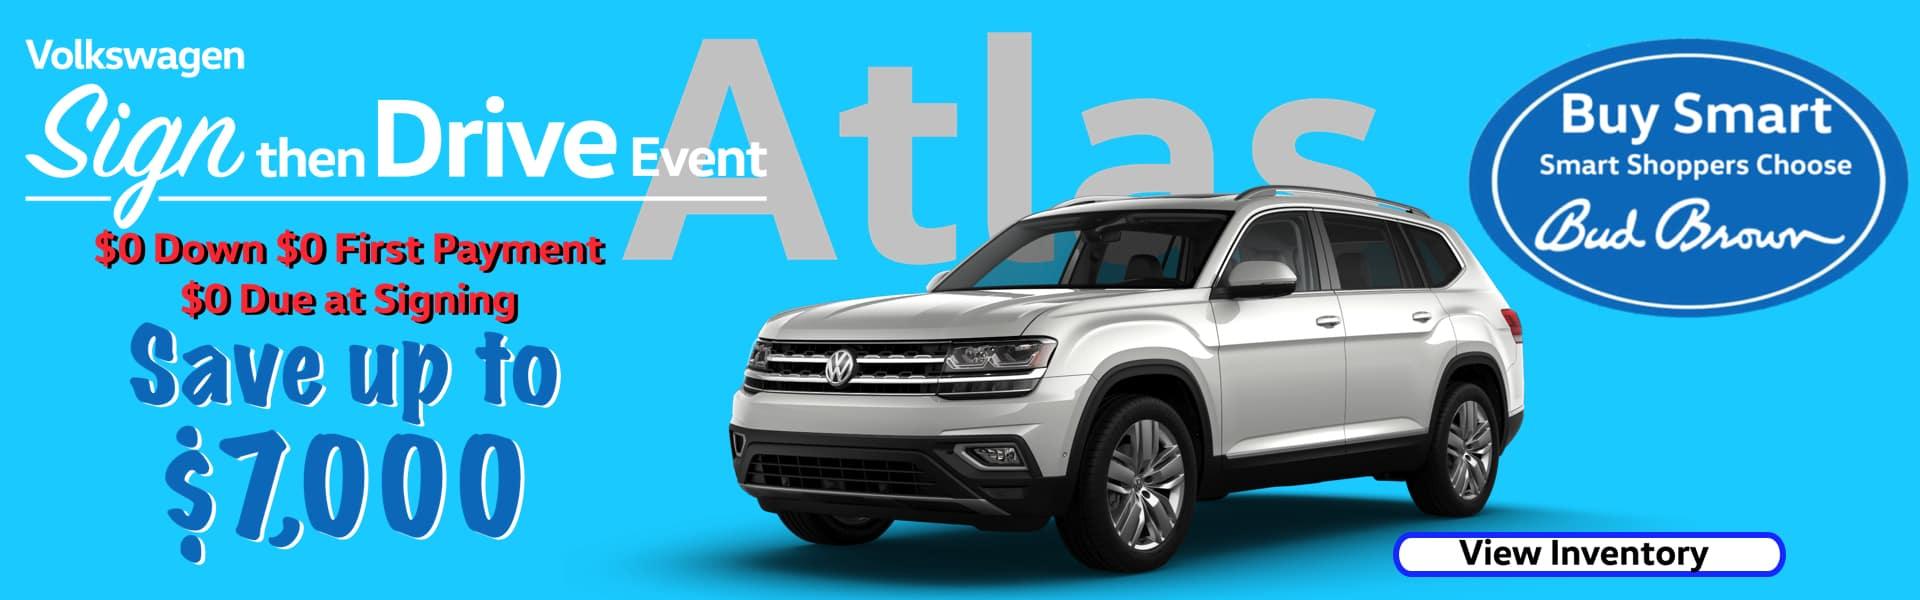 Save $7,000 on new Atlas at Bud Brown VW